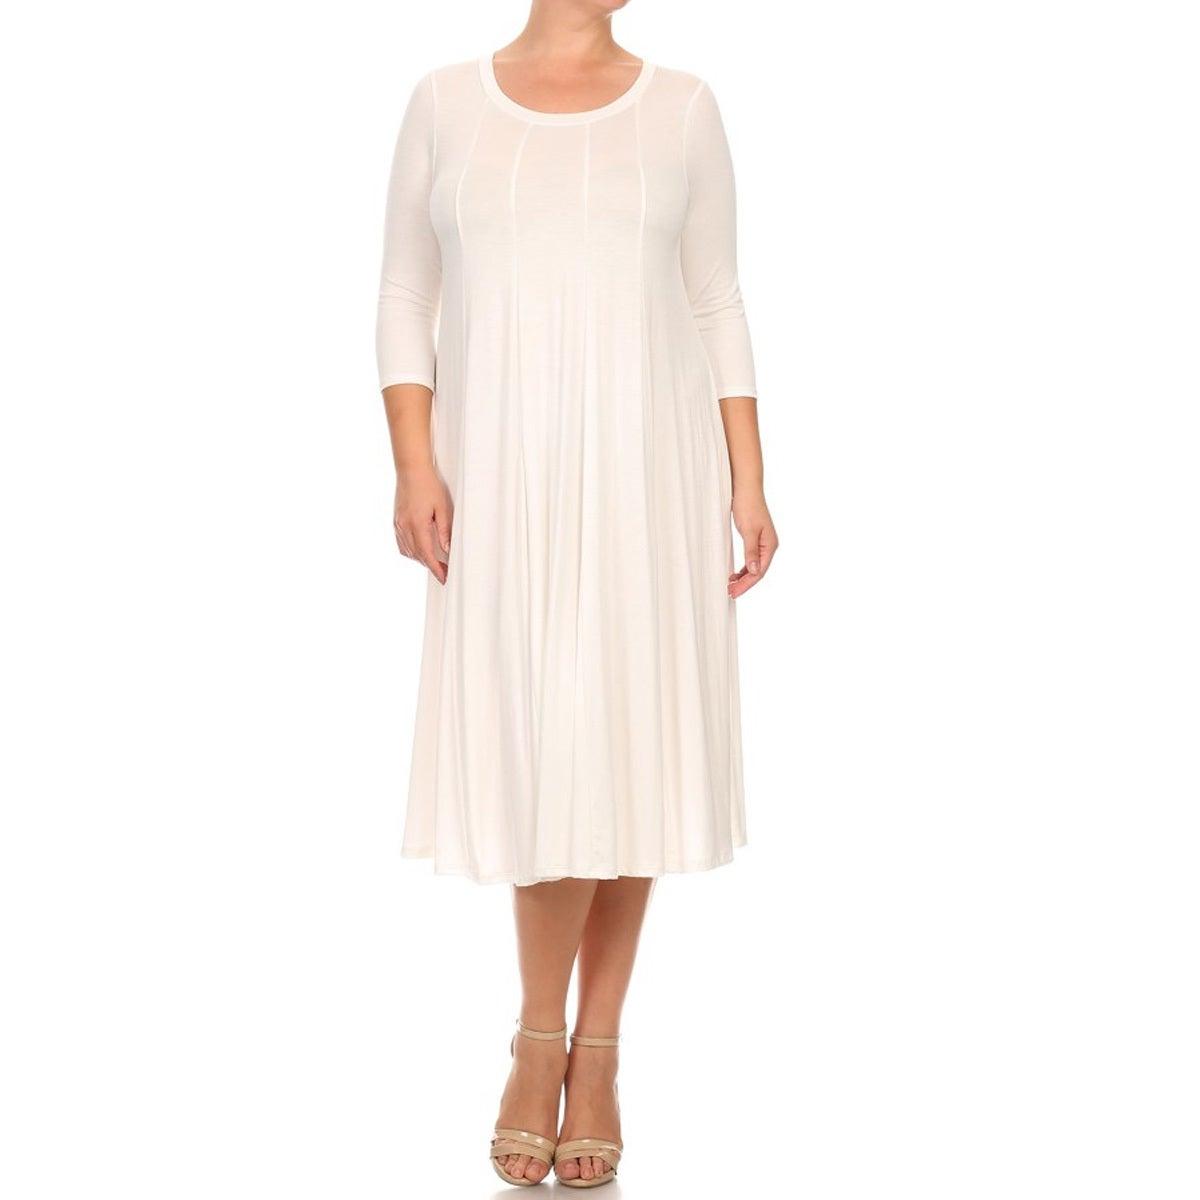 Women-039-s-Plus-Size-Solid-Color-Pleated-Dress thumbnail 7